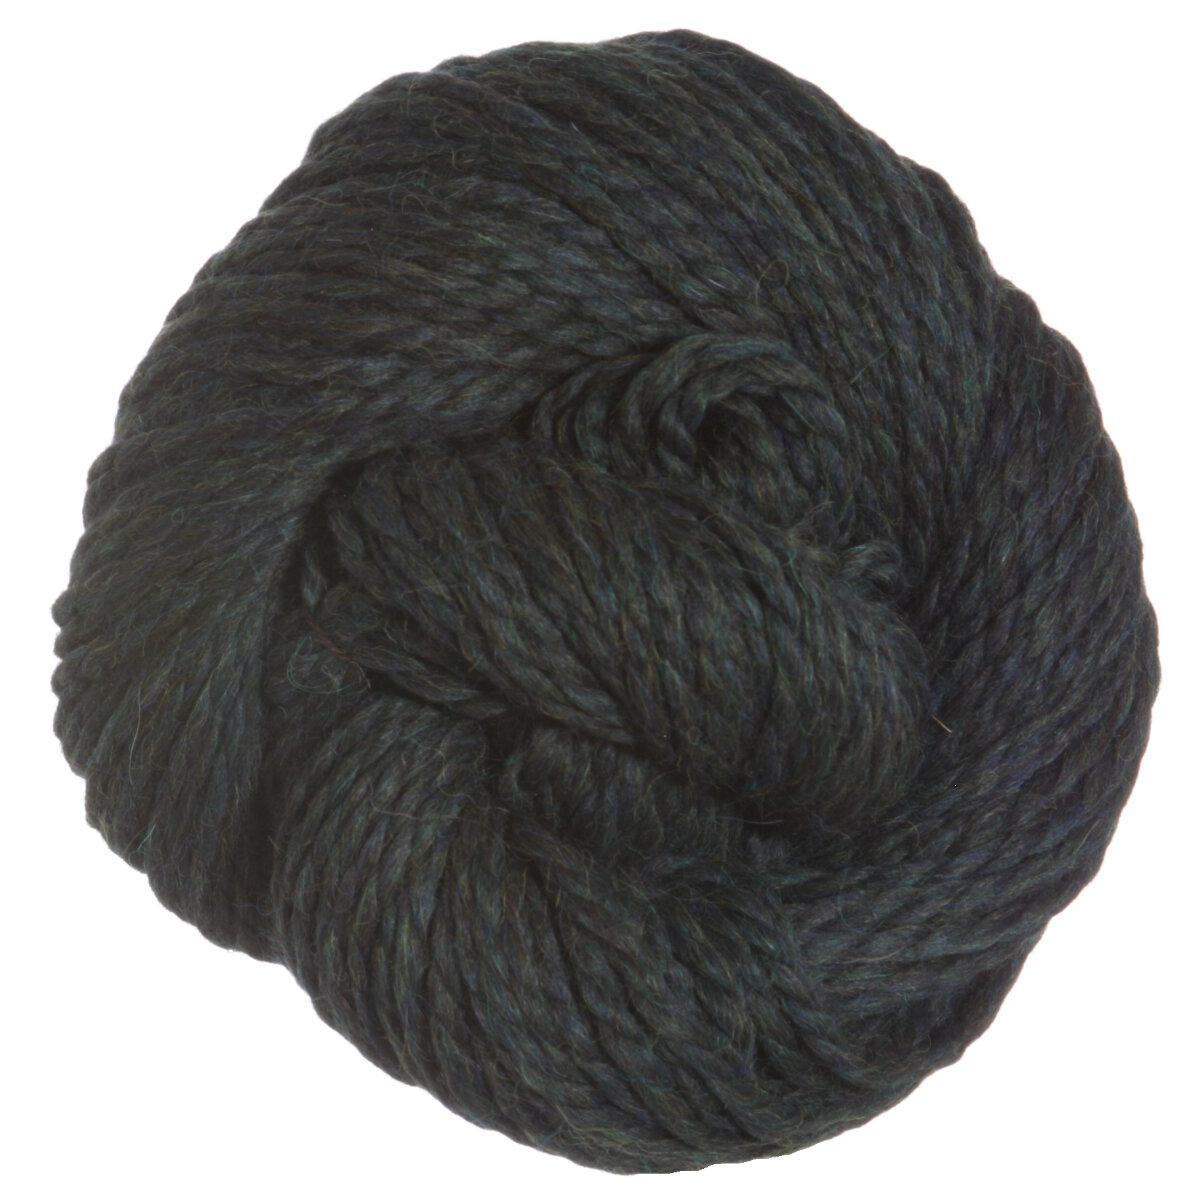 Plymouth Baby Alpaca Grande Yarn At Jimmy Beans Wool